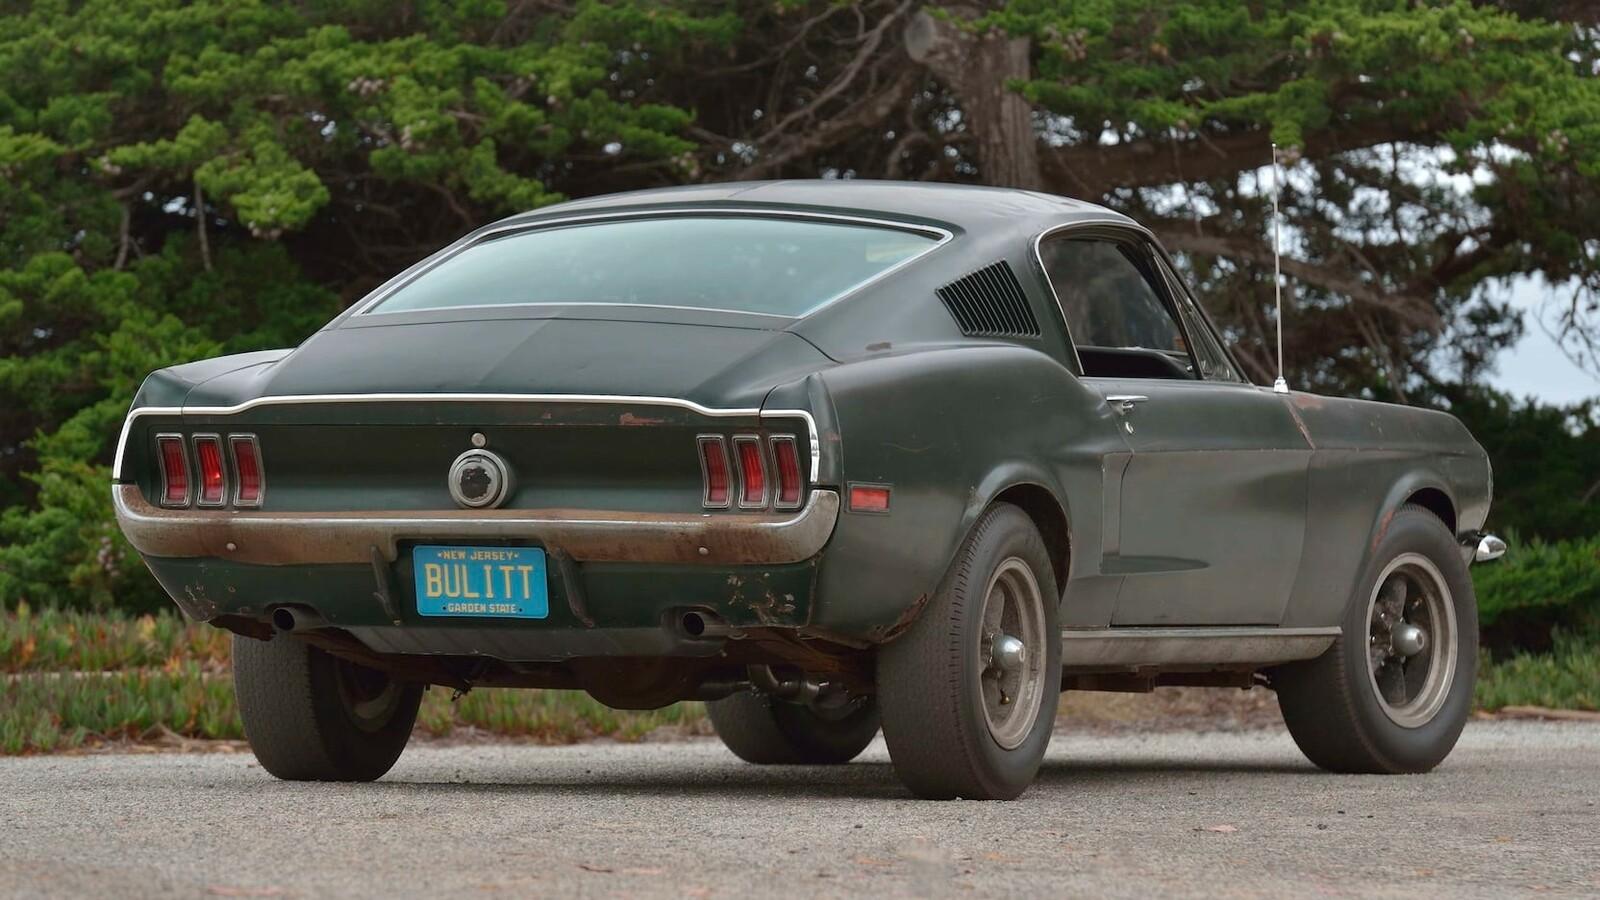 1968 Ford Mustang Gt From Bullitt 3